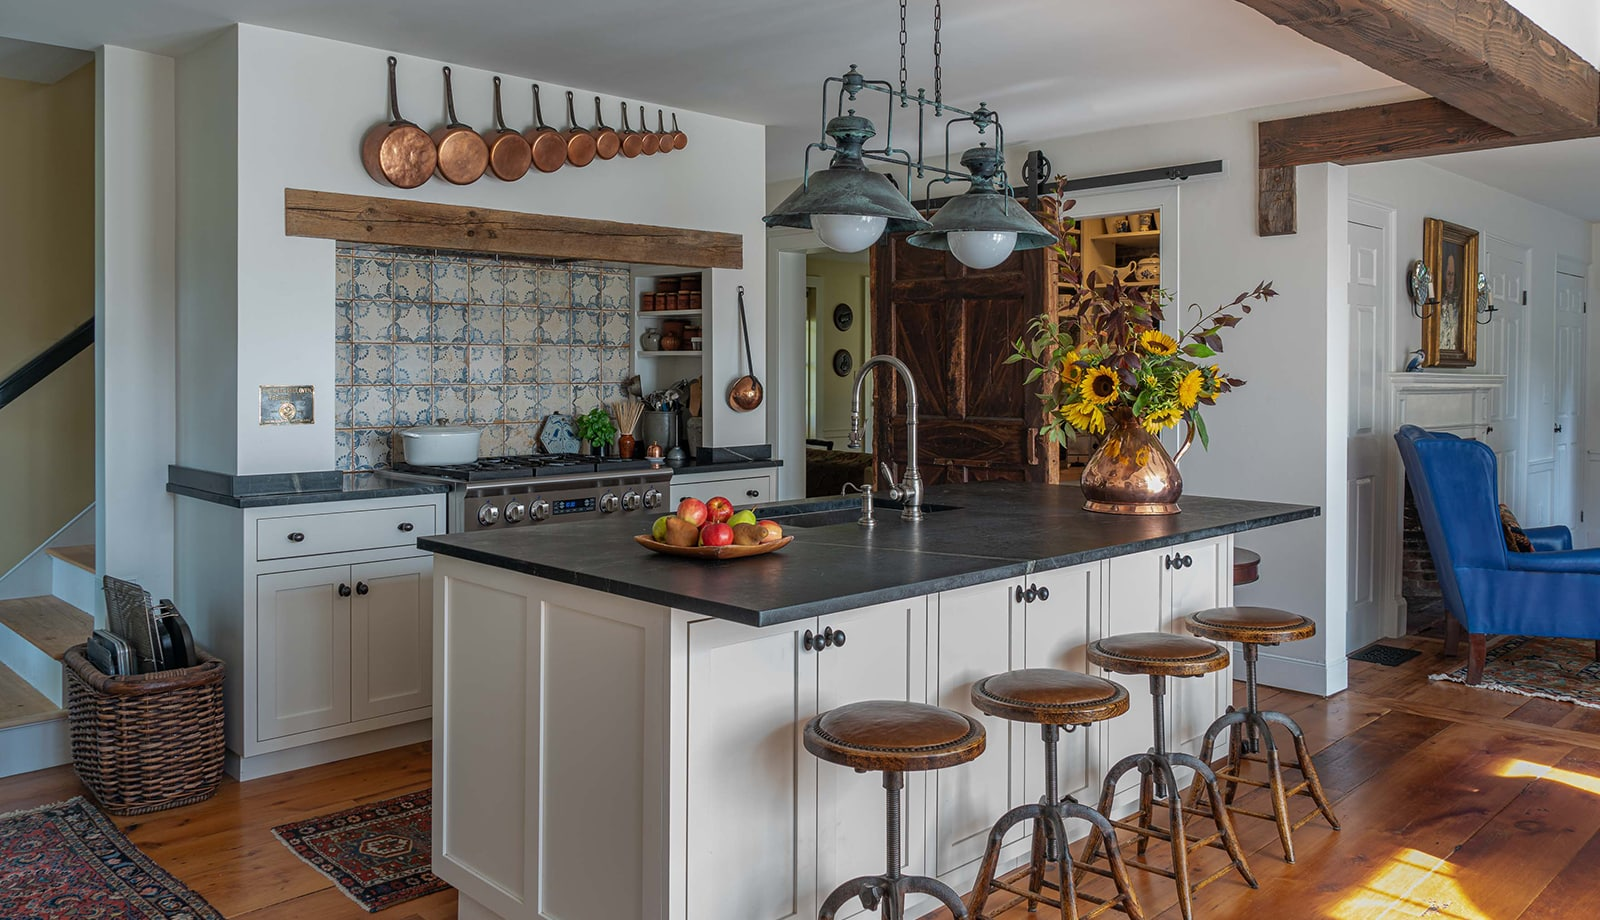 Arrowhead Farmhouse Newburyport MA Kitchen web